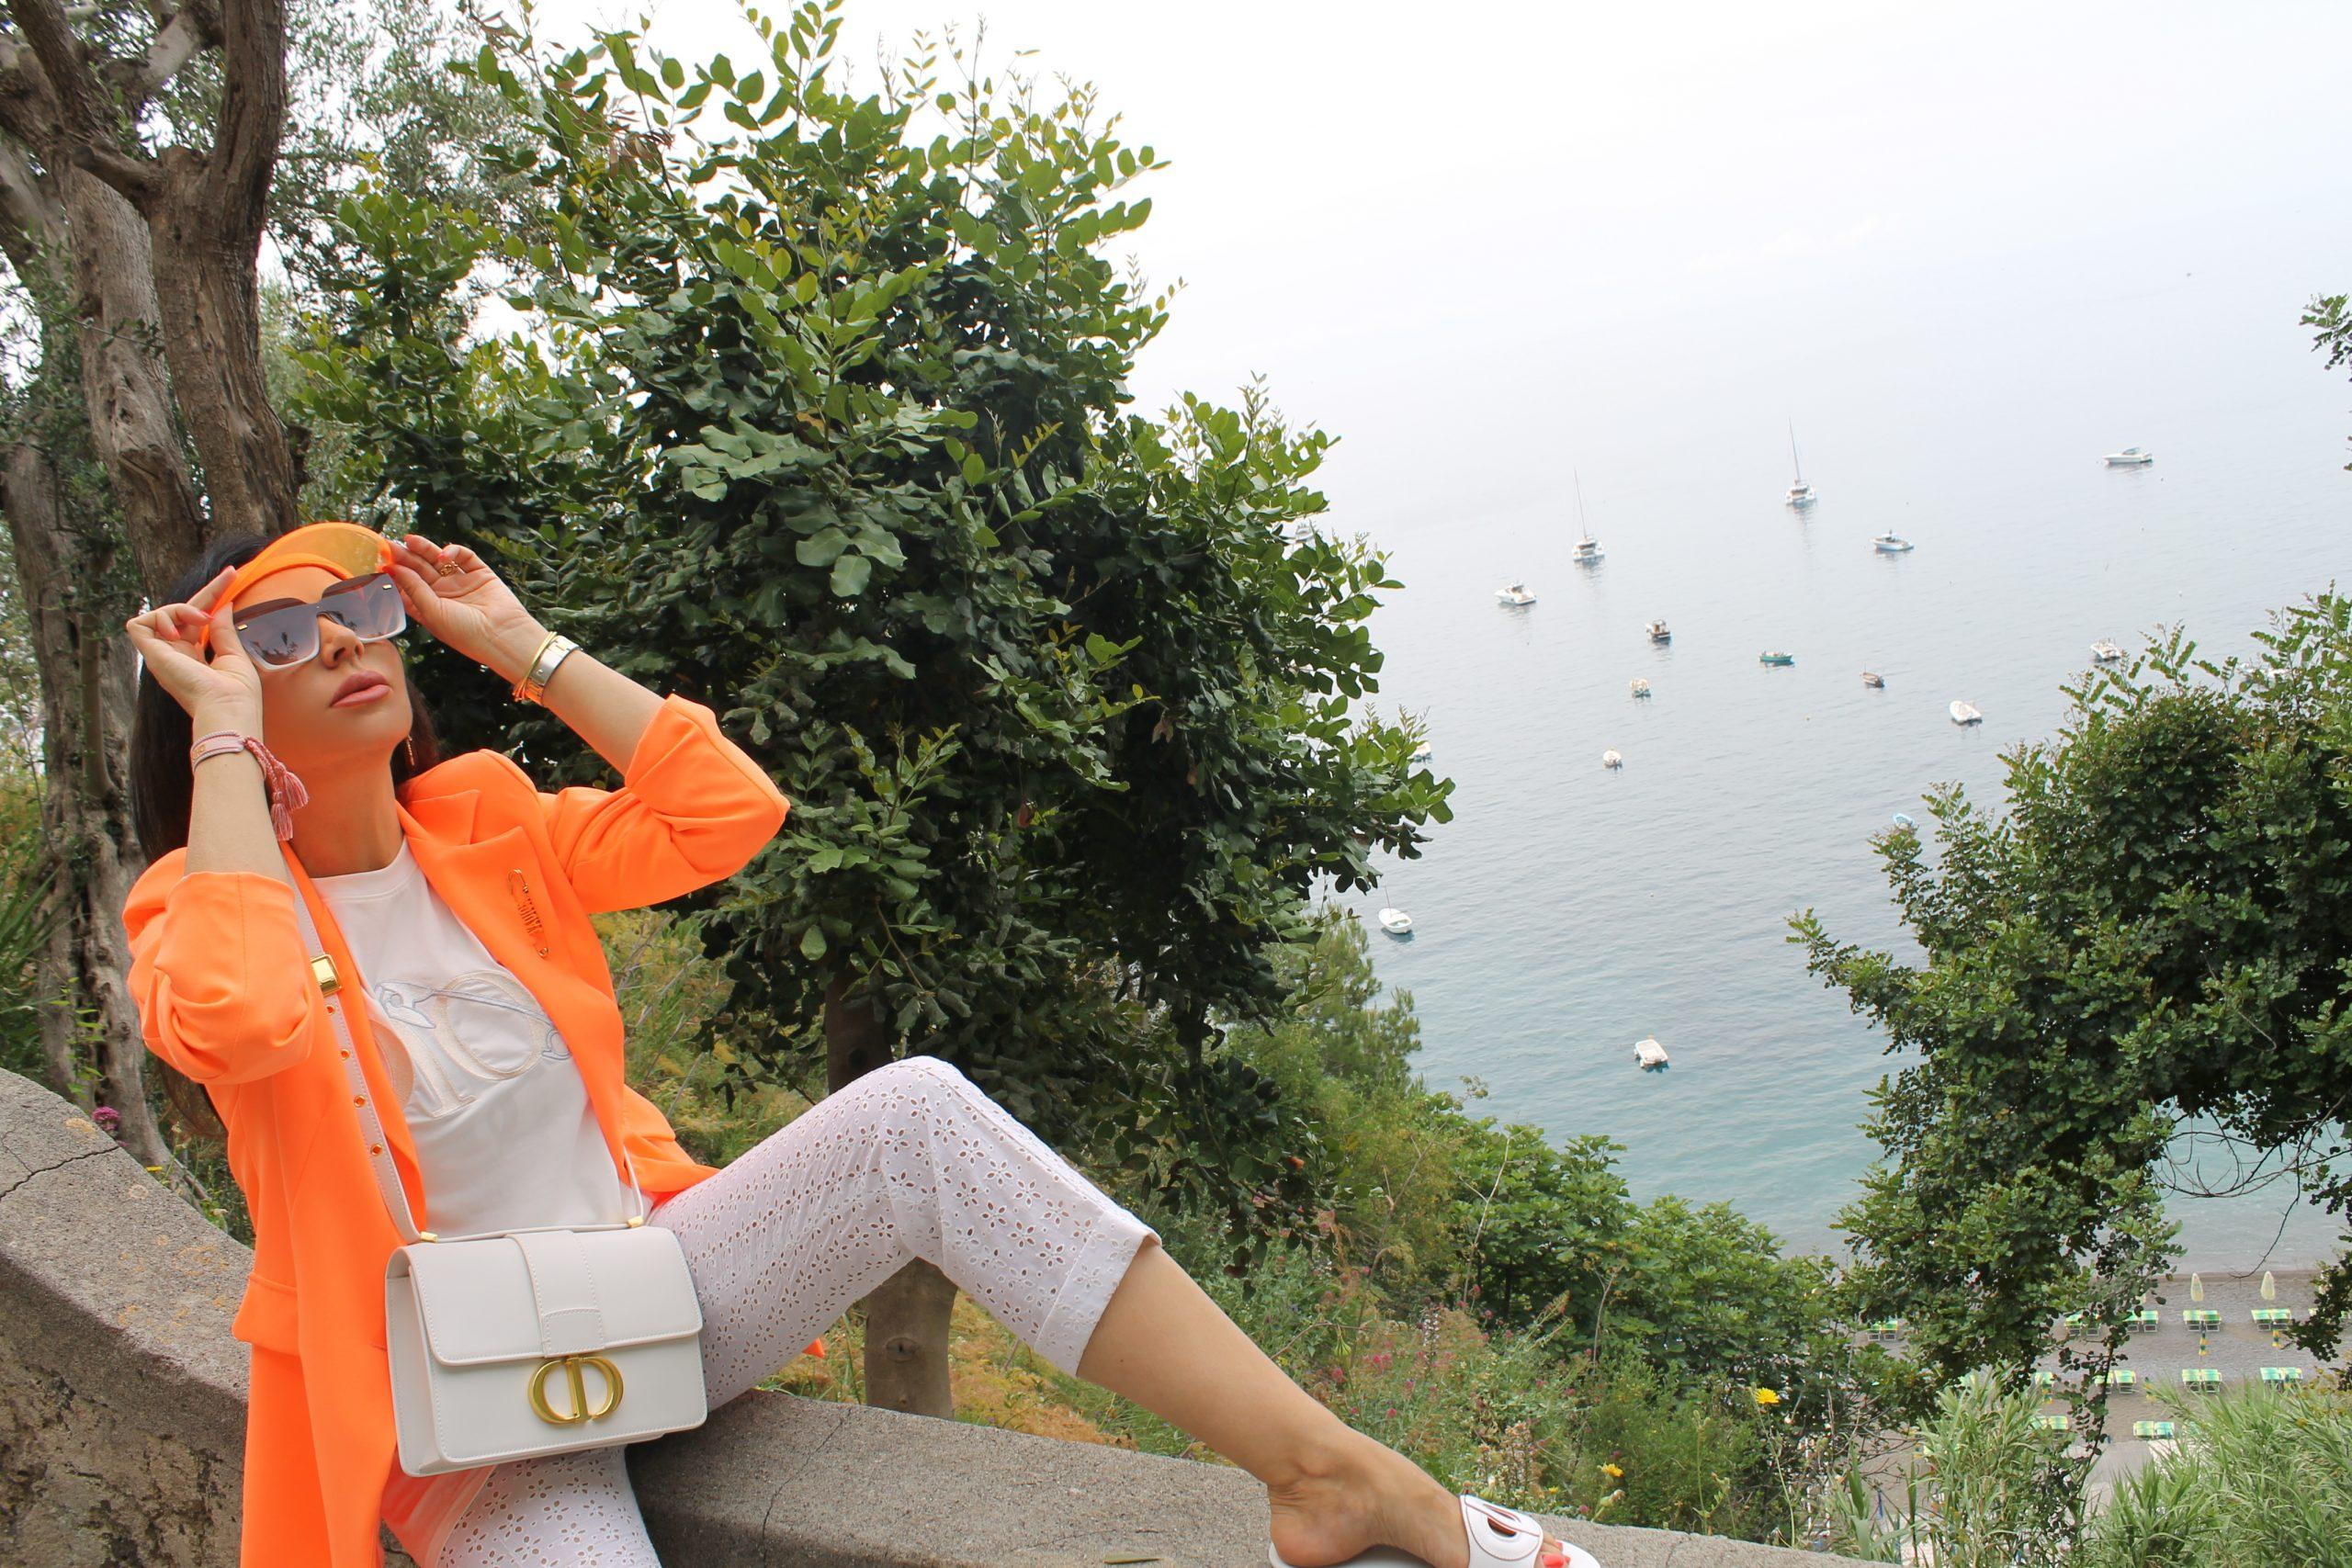 Positano Amalfi Coast Vacation Italian Holiday Inspo Aesthetic Dior Orange and White Paola Lauretano